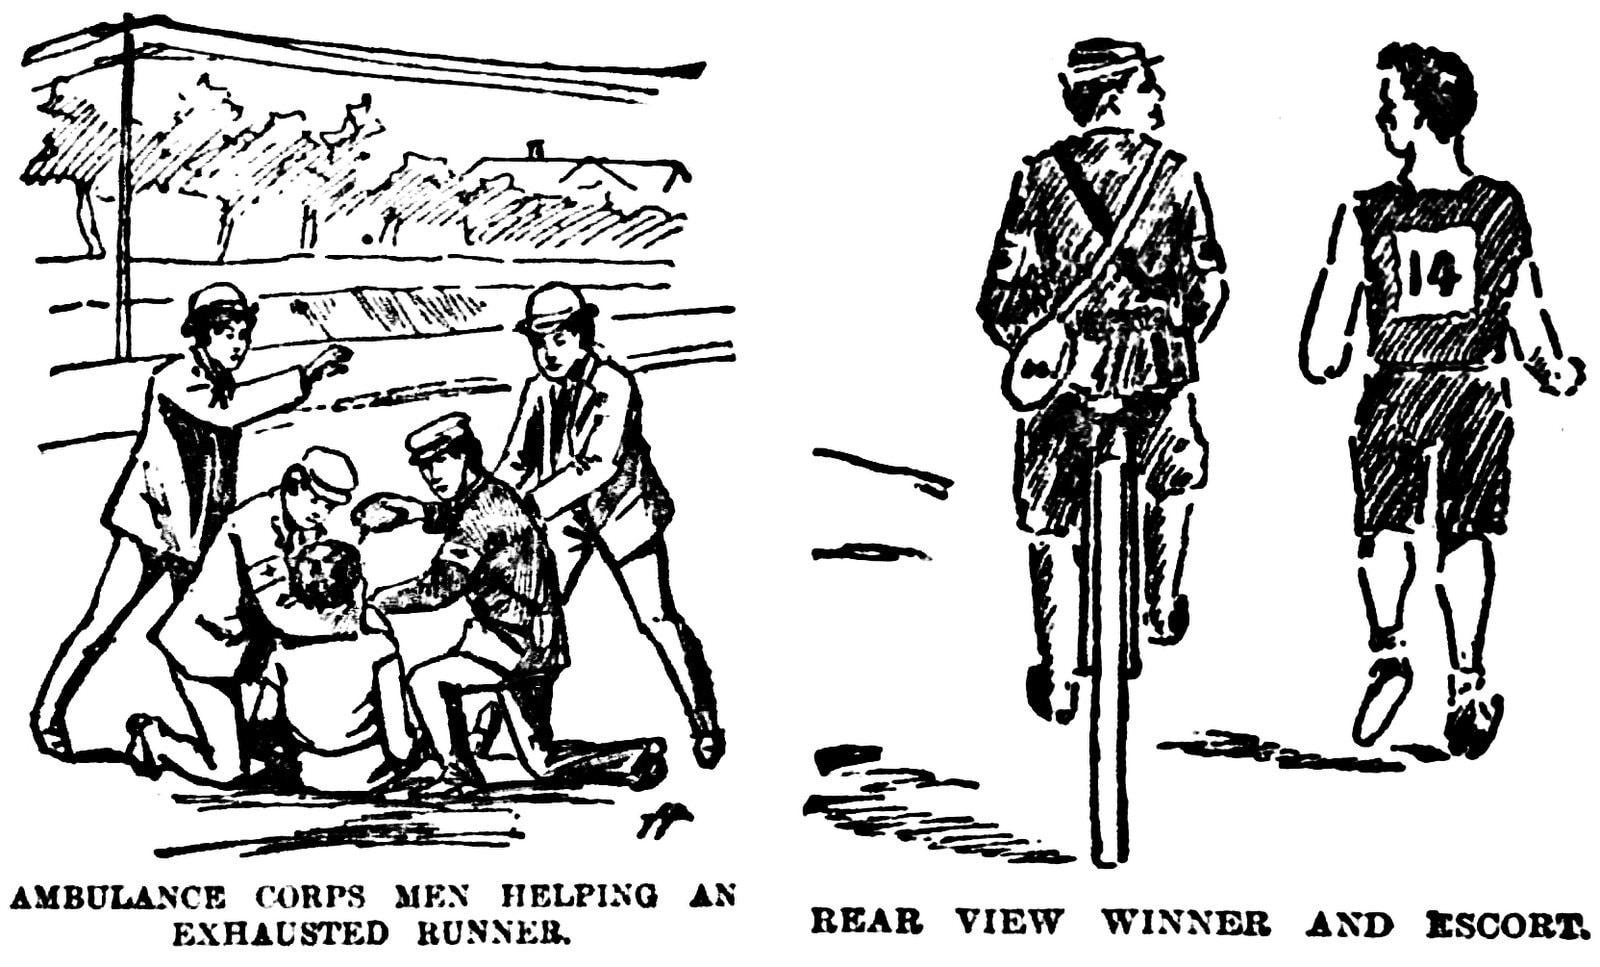 Boston Globe coverage of first Boston Marathon - Newspaper date April 20 1897